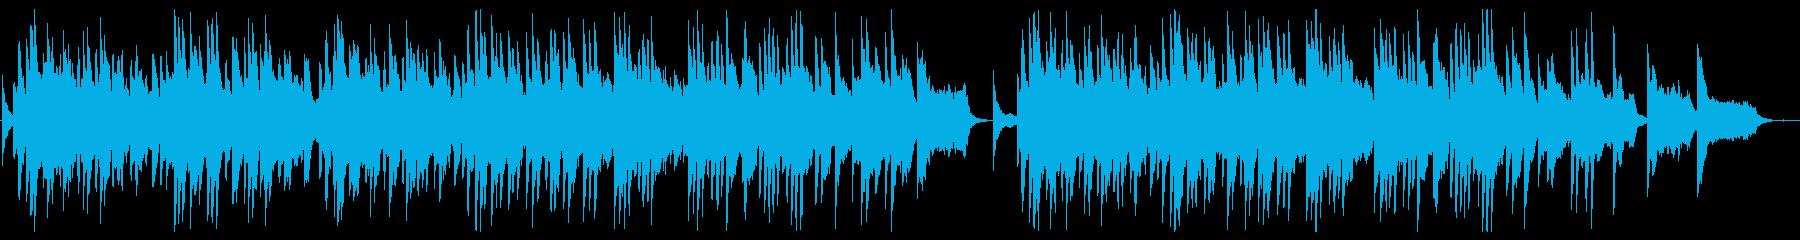 Sad and sad piano slowball's reproduced waveform